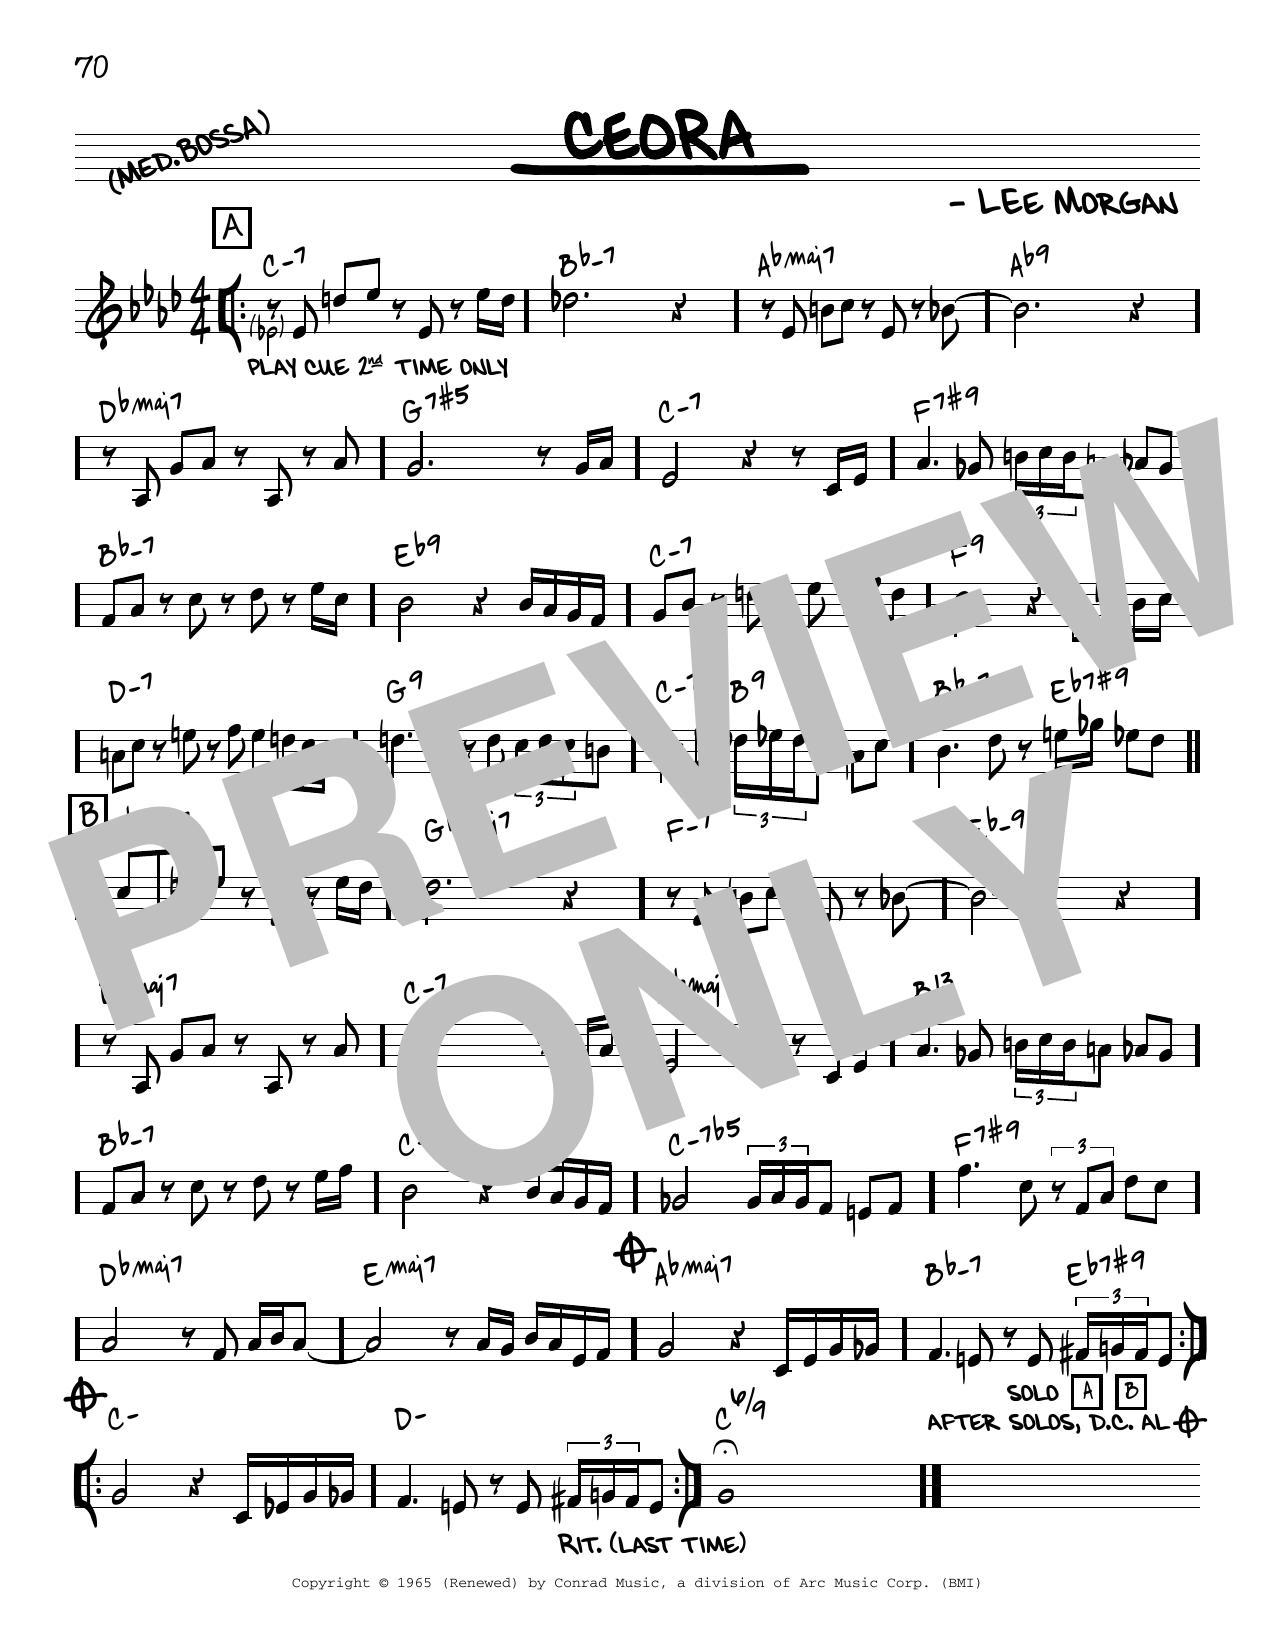 Lee Morgan Ceora [Reharmonized version] (arr. Jack Grassel) sheet music notes printable PDF score